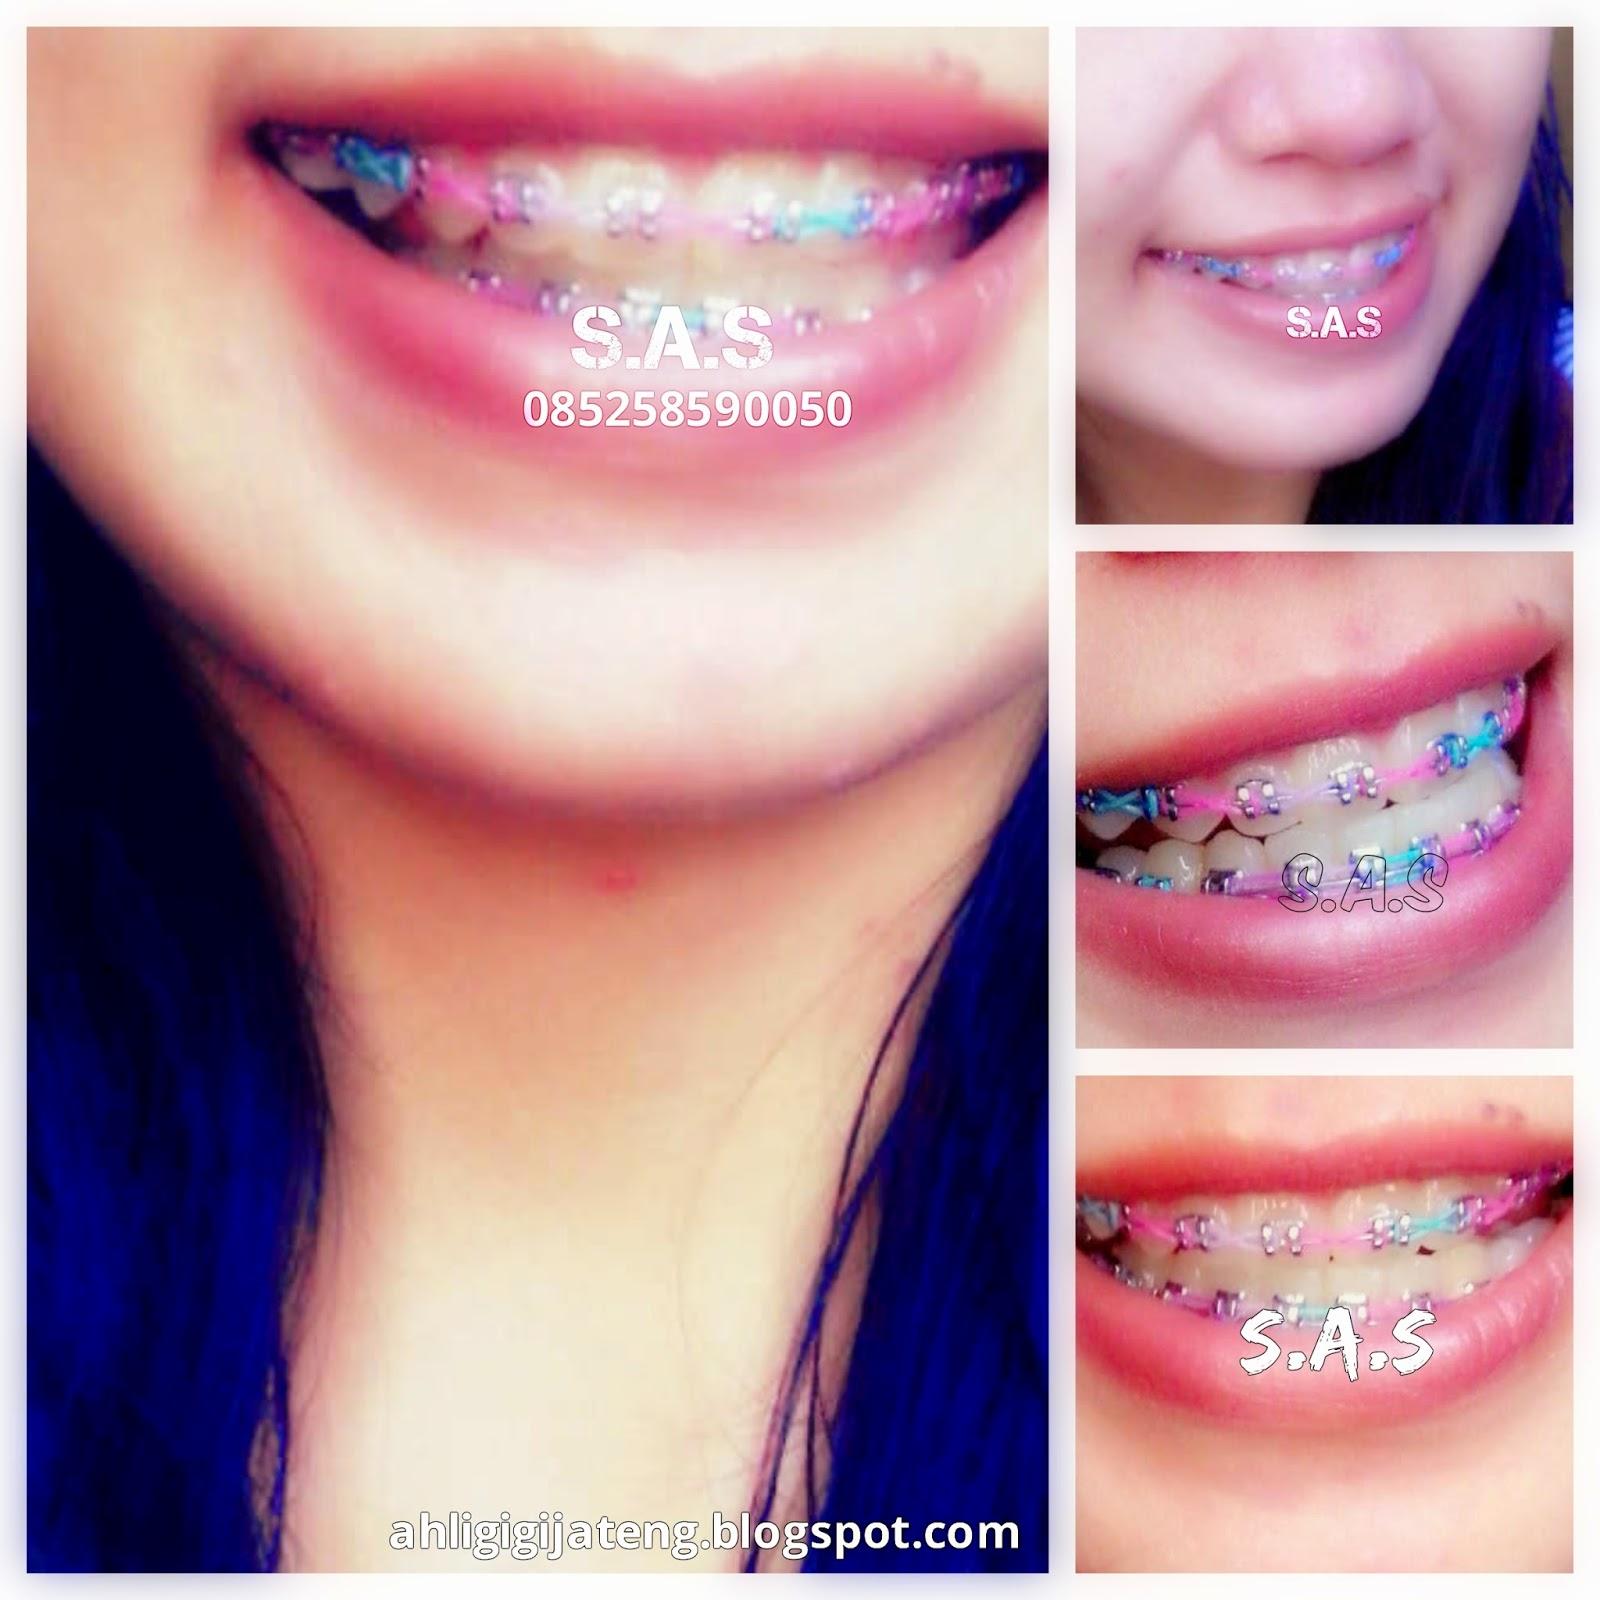 Foto Senyum Cewek Berbehel Berkawat Gigi Cantik S A